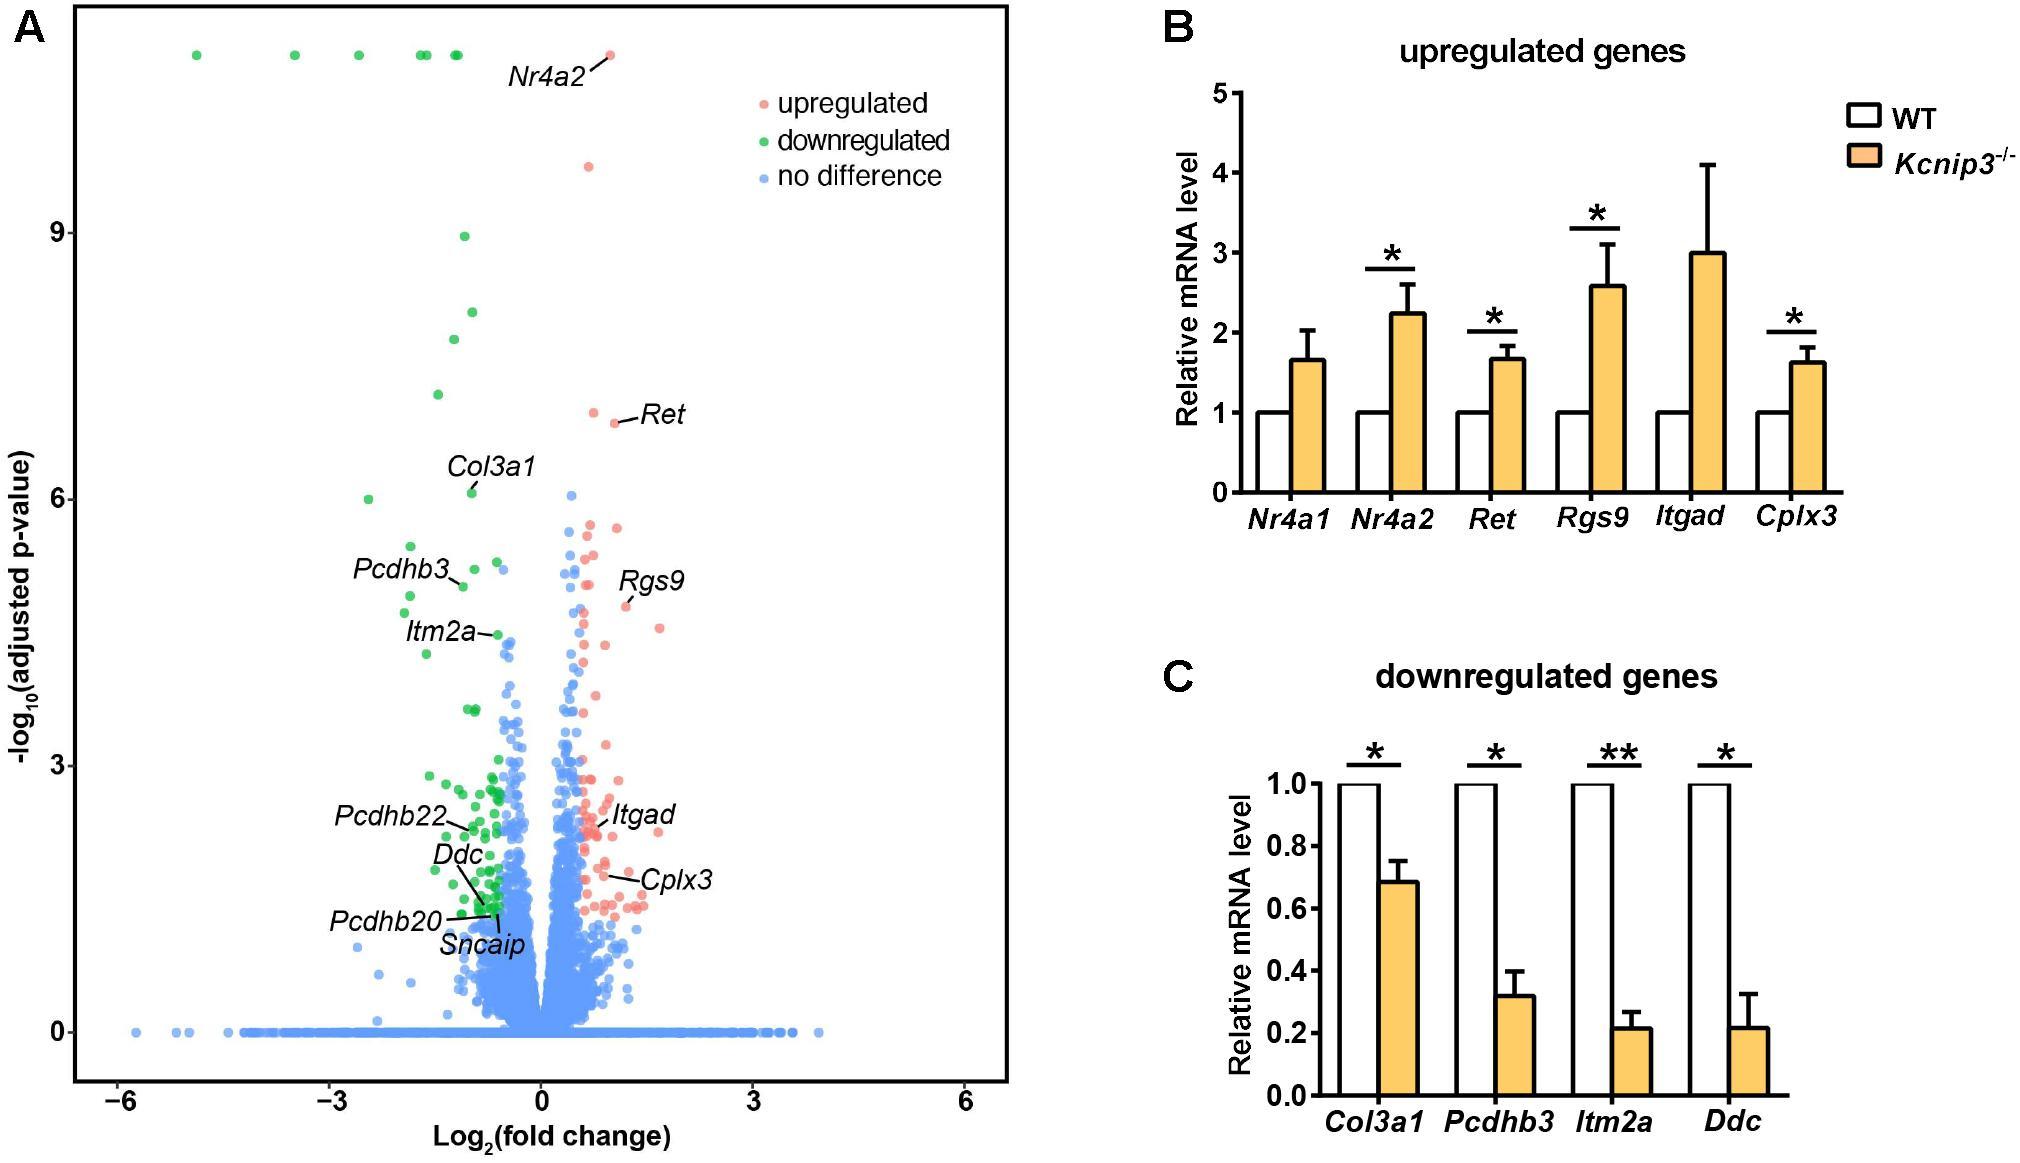 Frontiers | Global Gene Knockout of Kcnip3 Enhances Pain Sensitivity